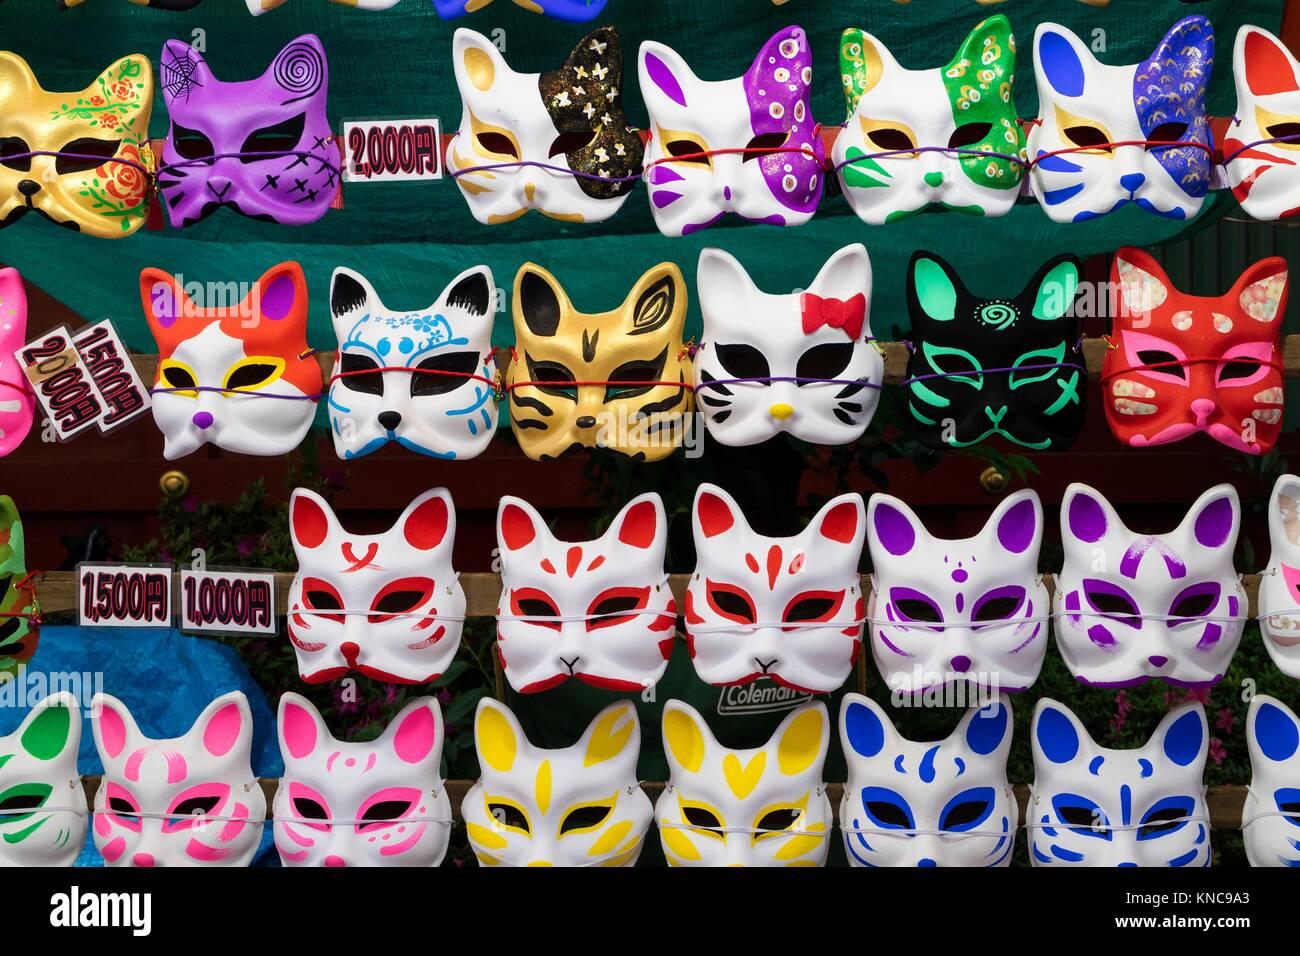 Tokyo, Japan - May 14, 2017: Cat masks for sale hanging on the wall at the Kanda Matsuri Festival. Stock Photo